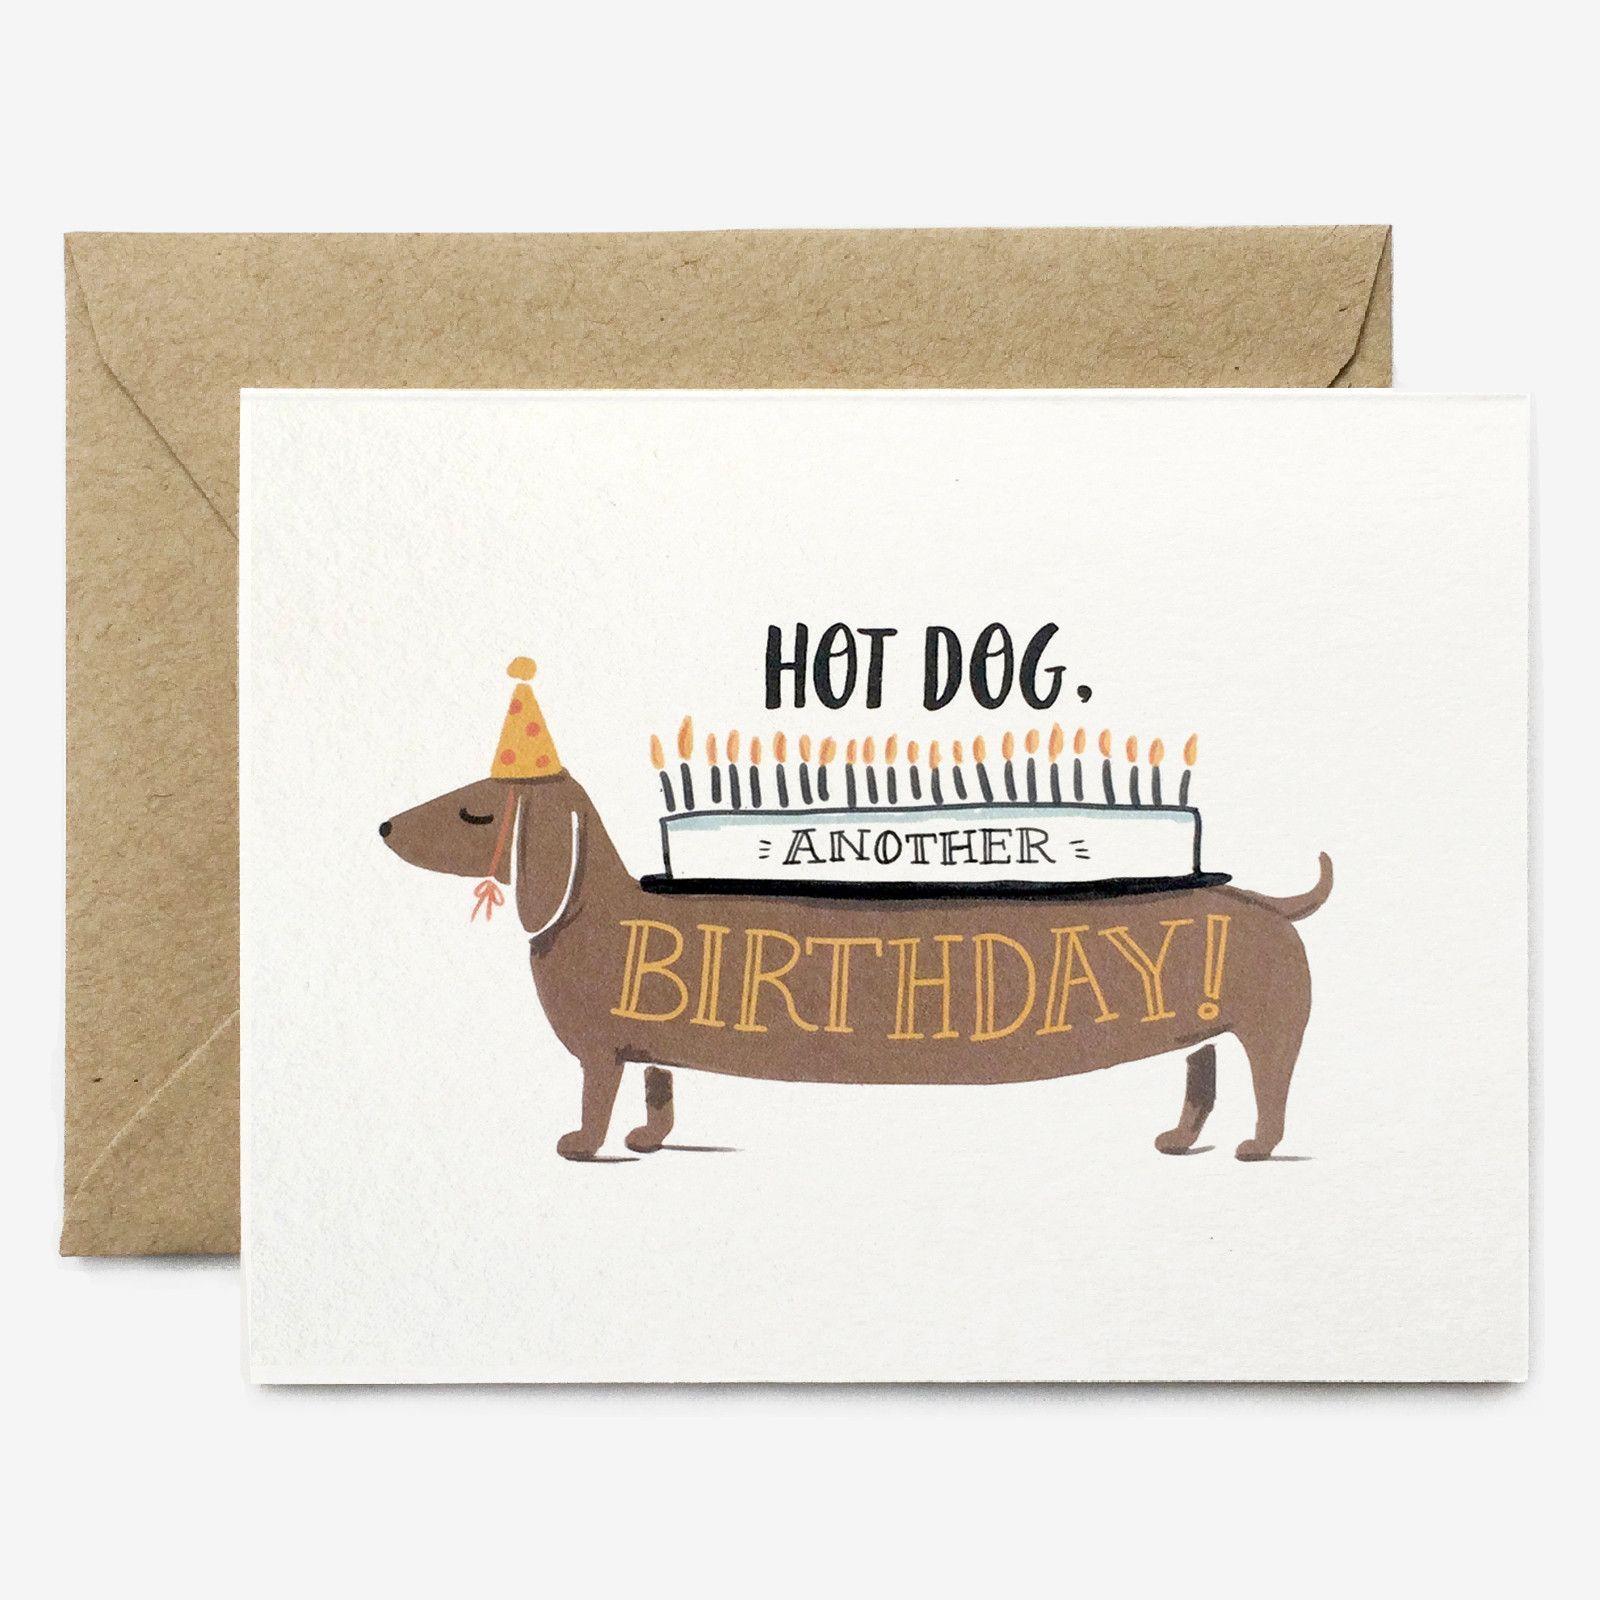 Hot Dog Birthday Card Cello Envelopes And Brown